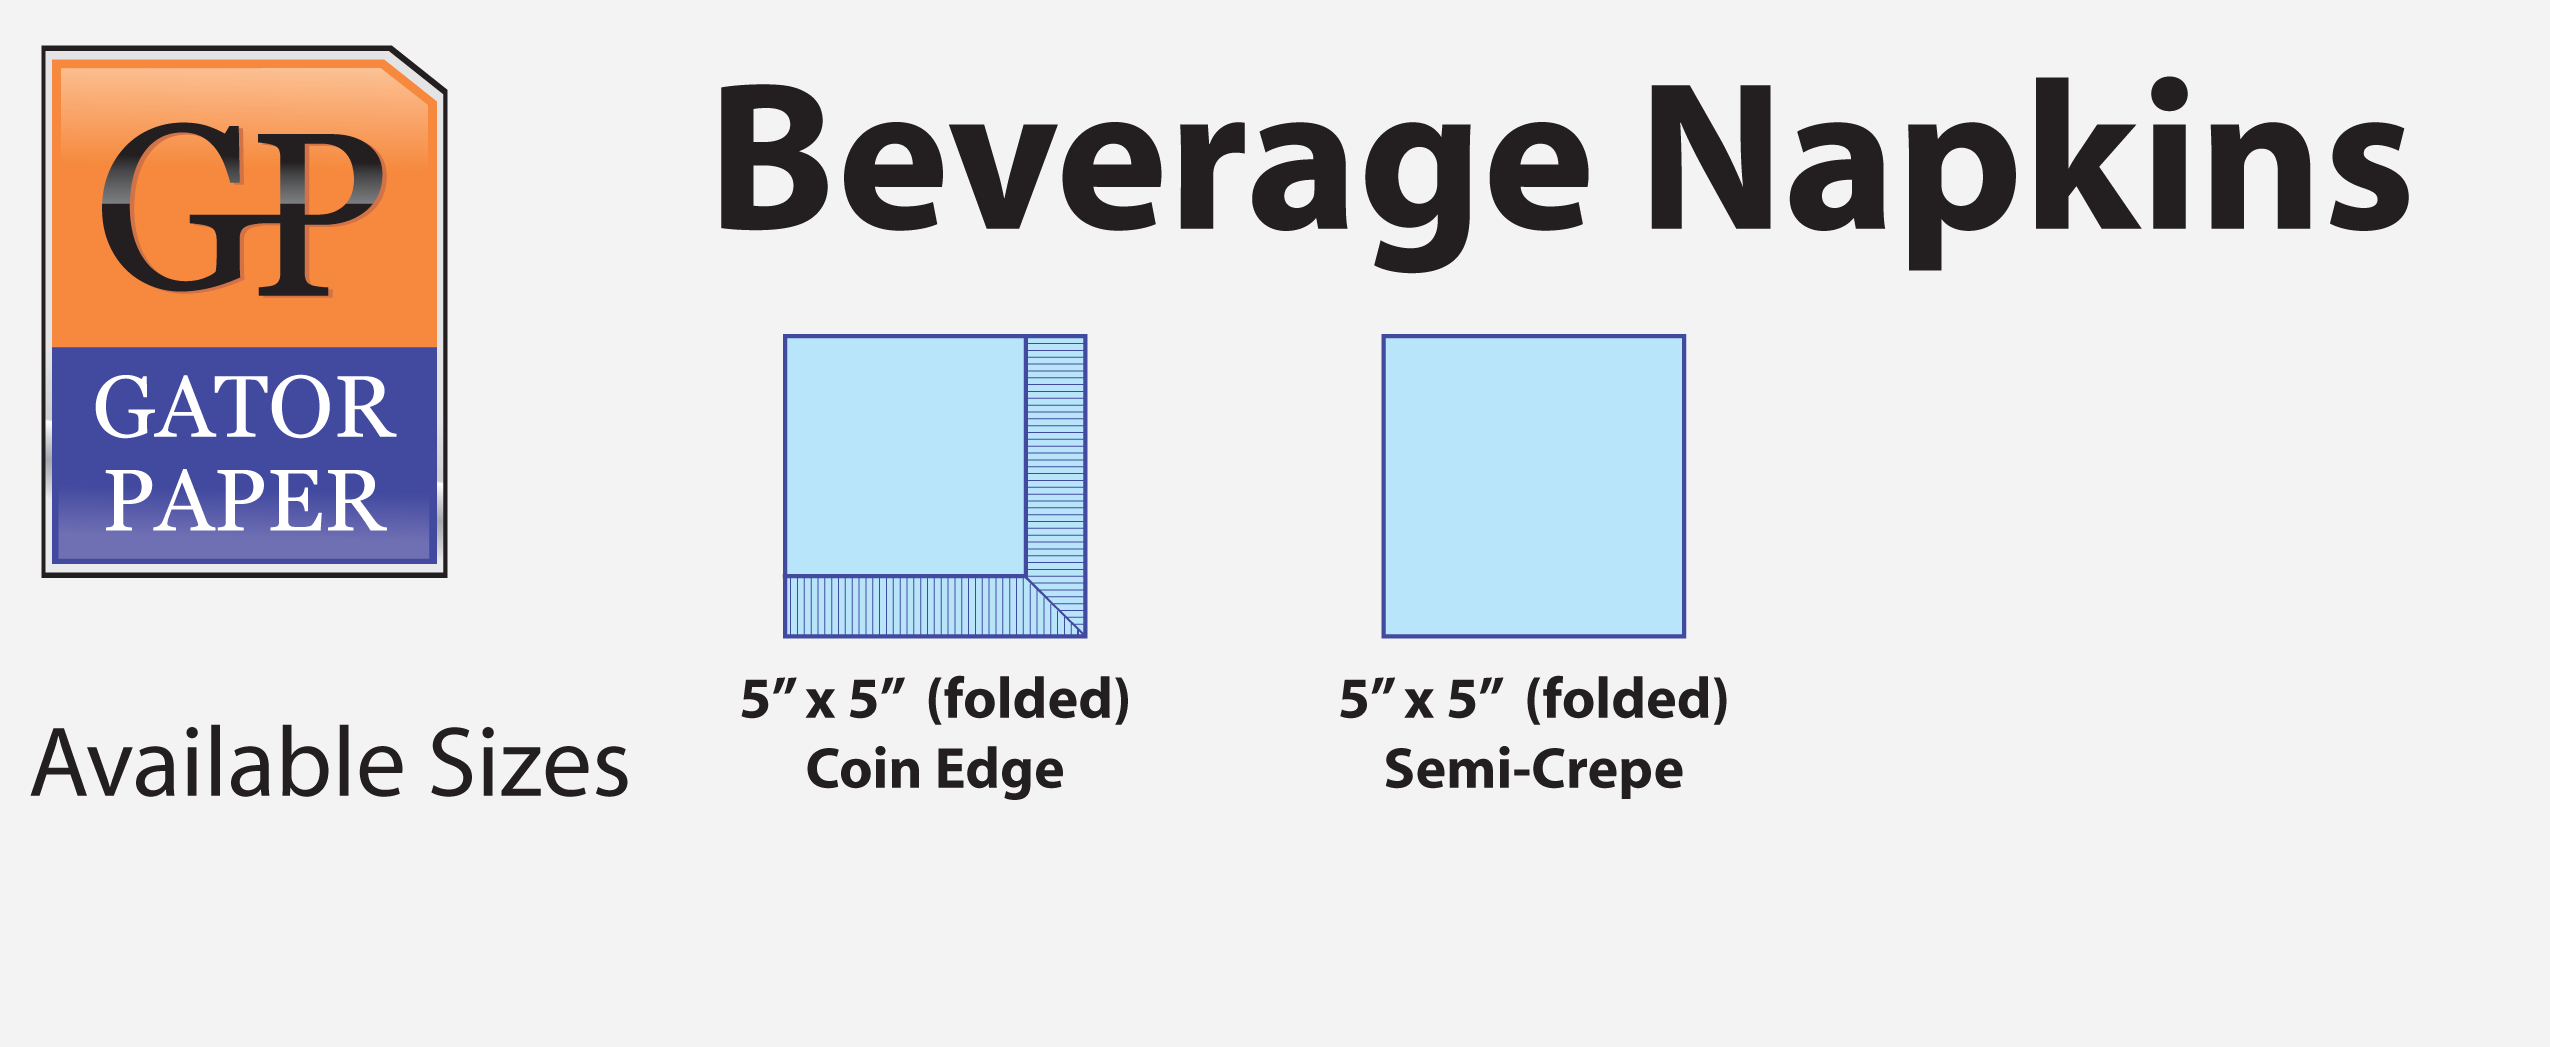 Custom Printed Beverage Napkins